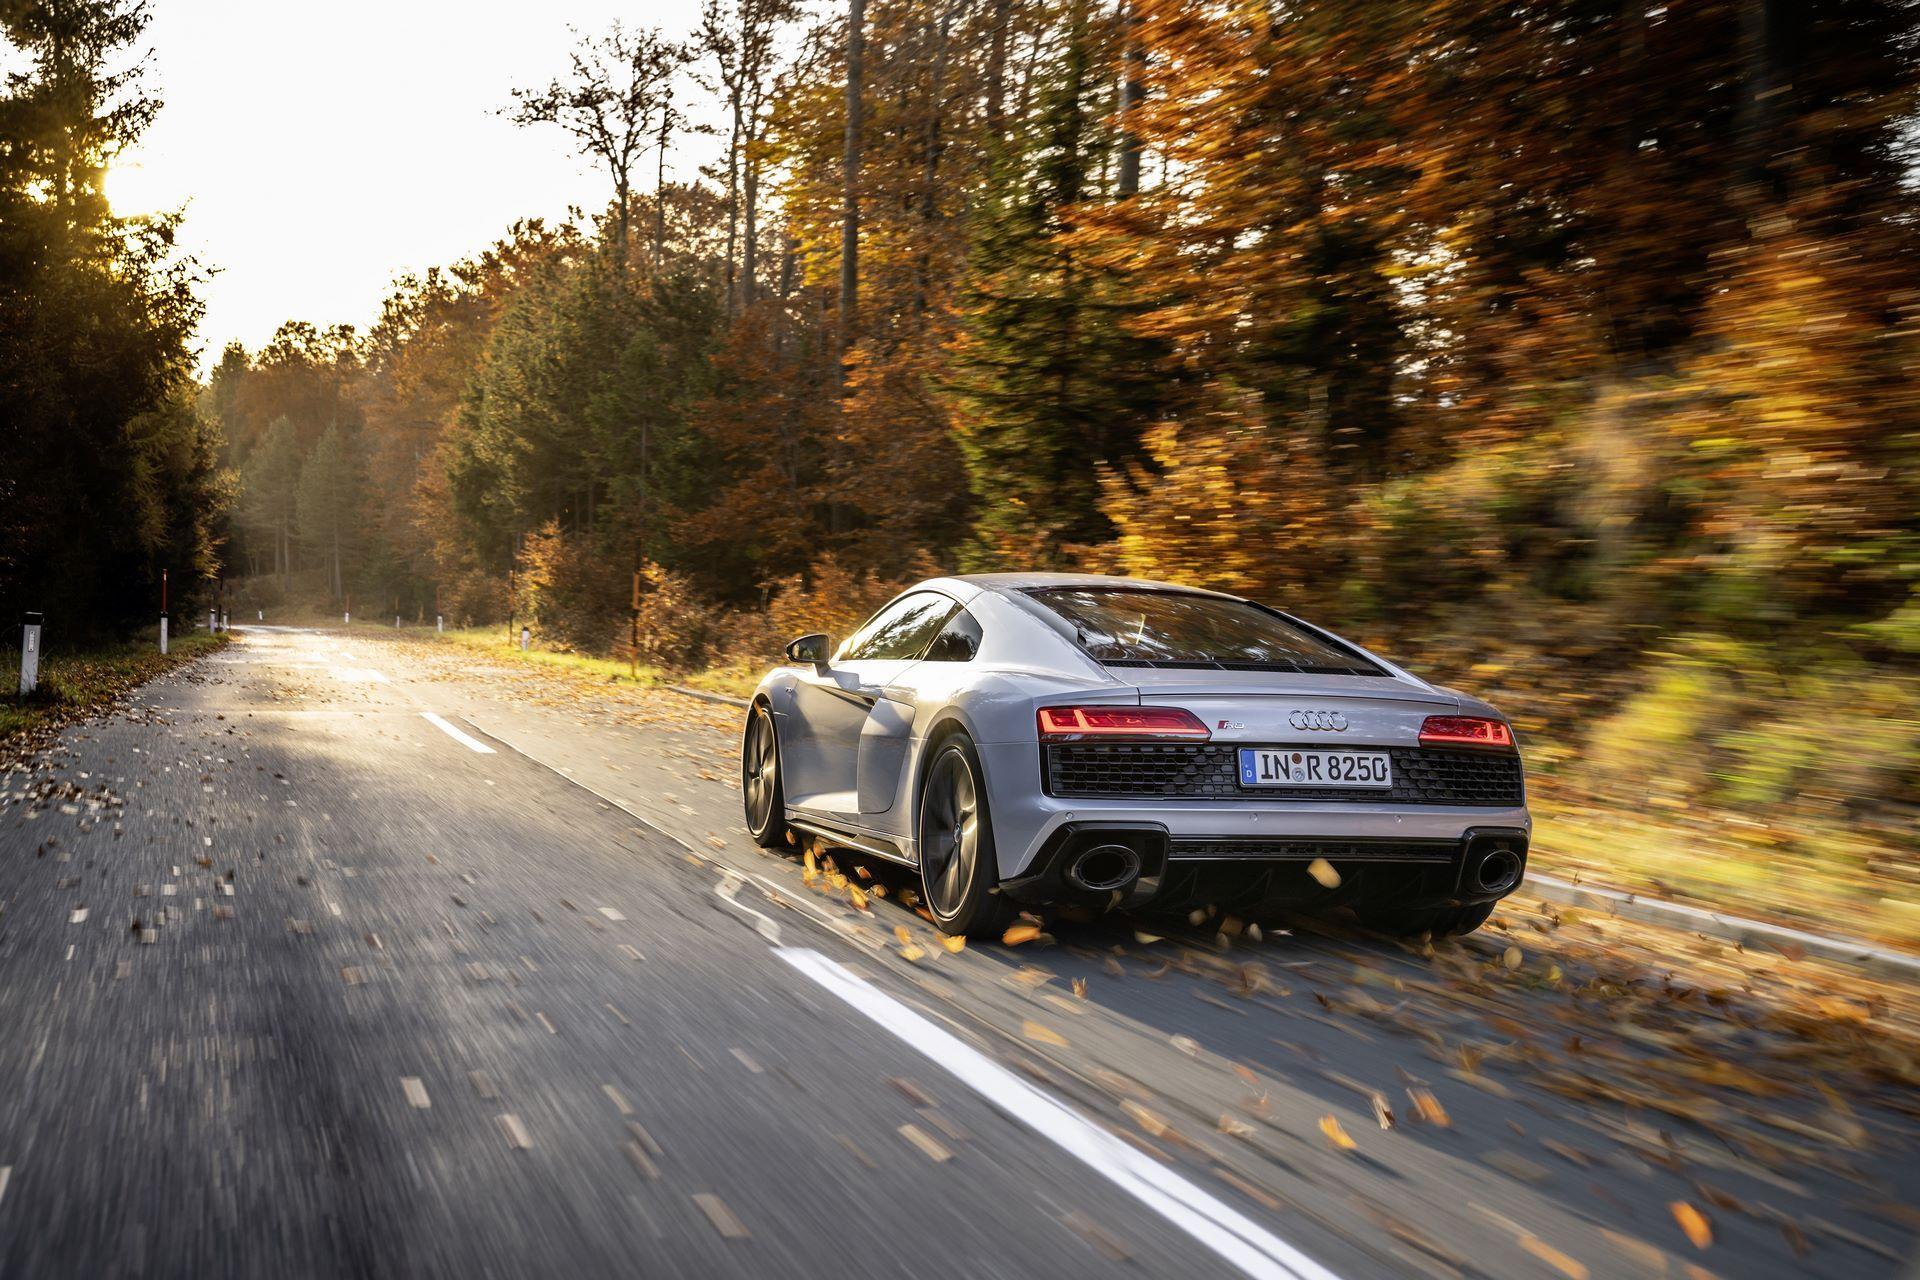 Audi R8 V10 RWD Coupé